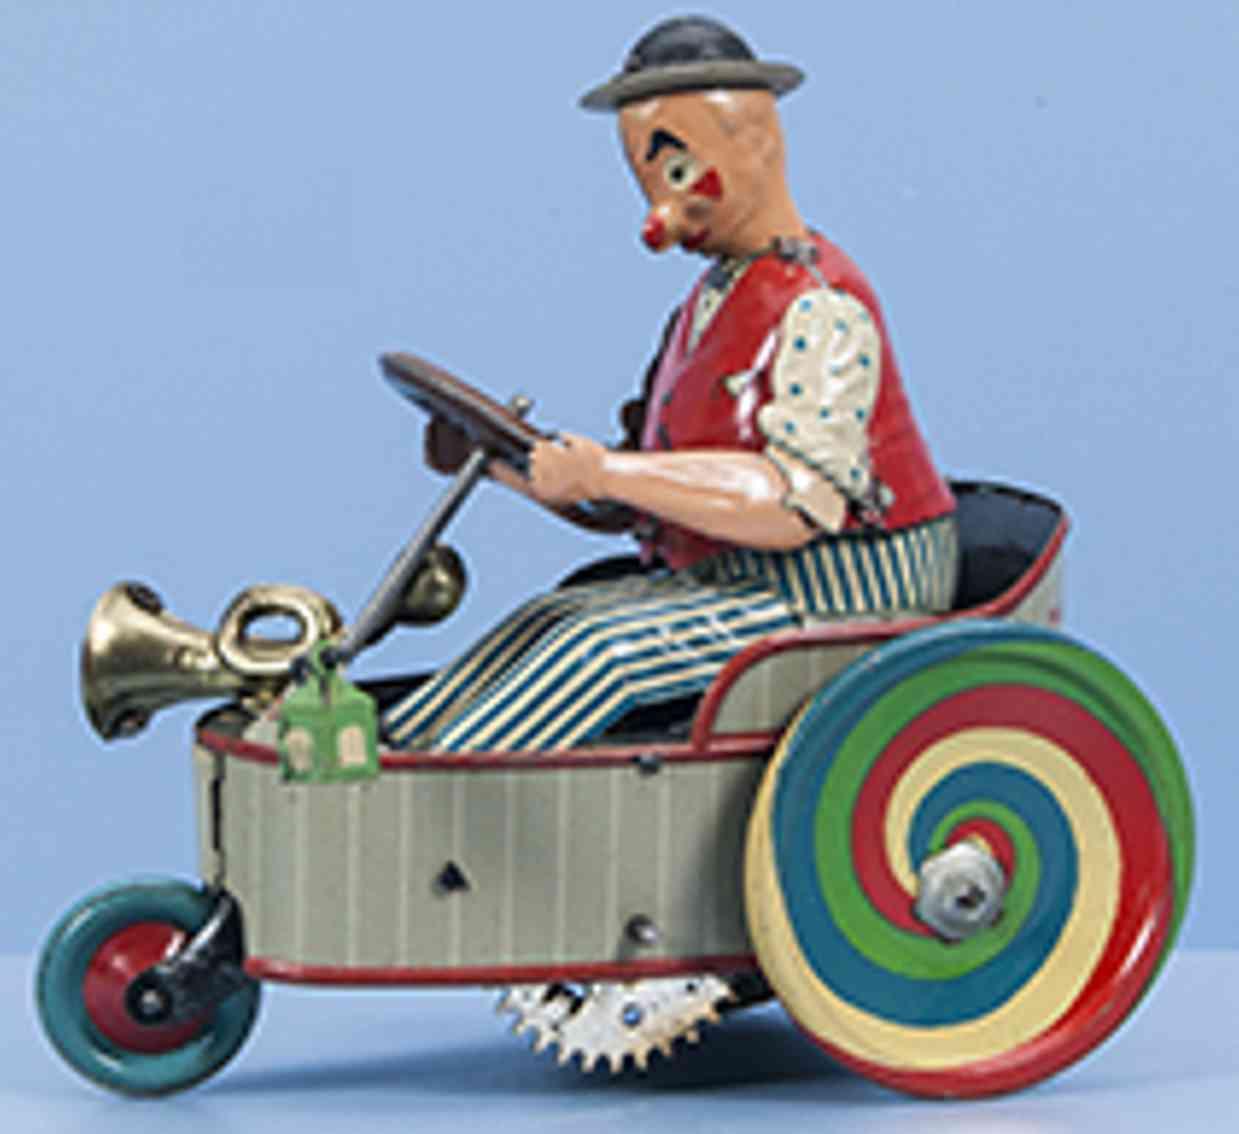 lehmann 775 tin toy car peter wind up eccentric gray three wheeled car white driver